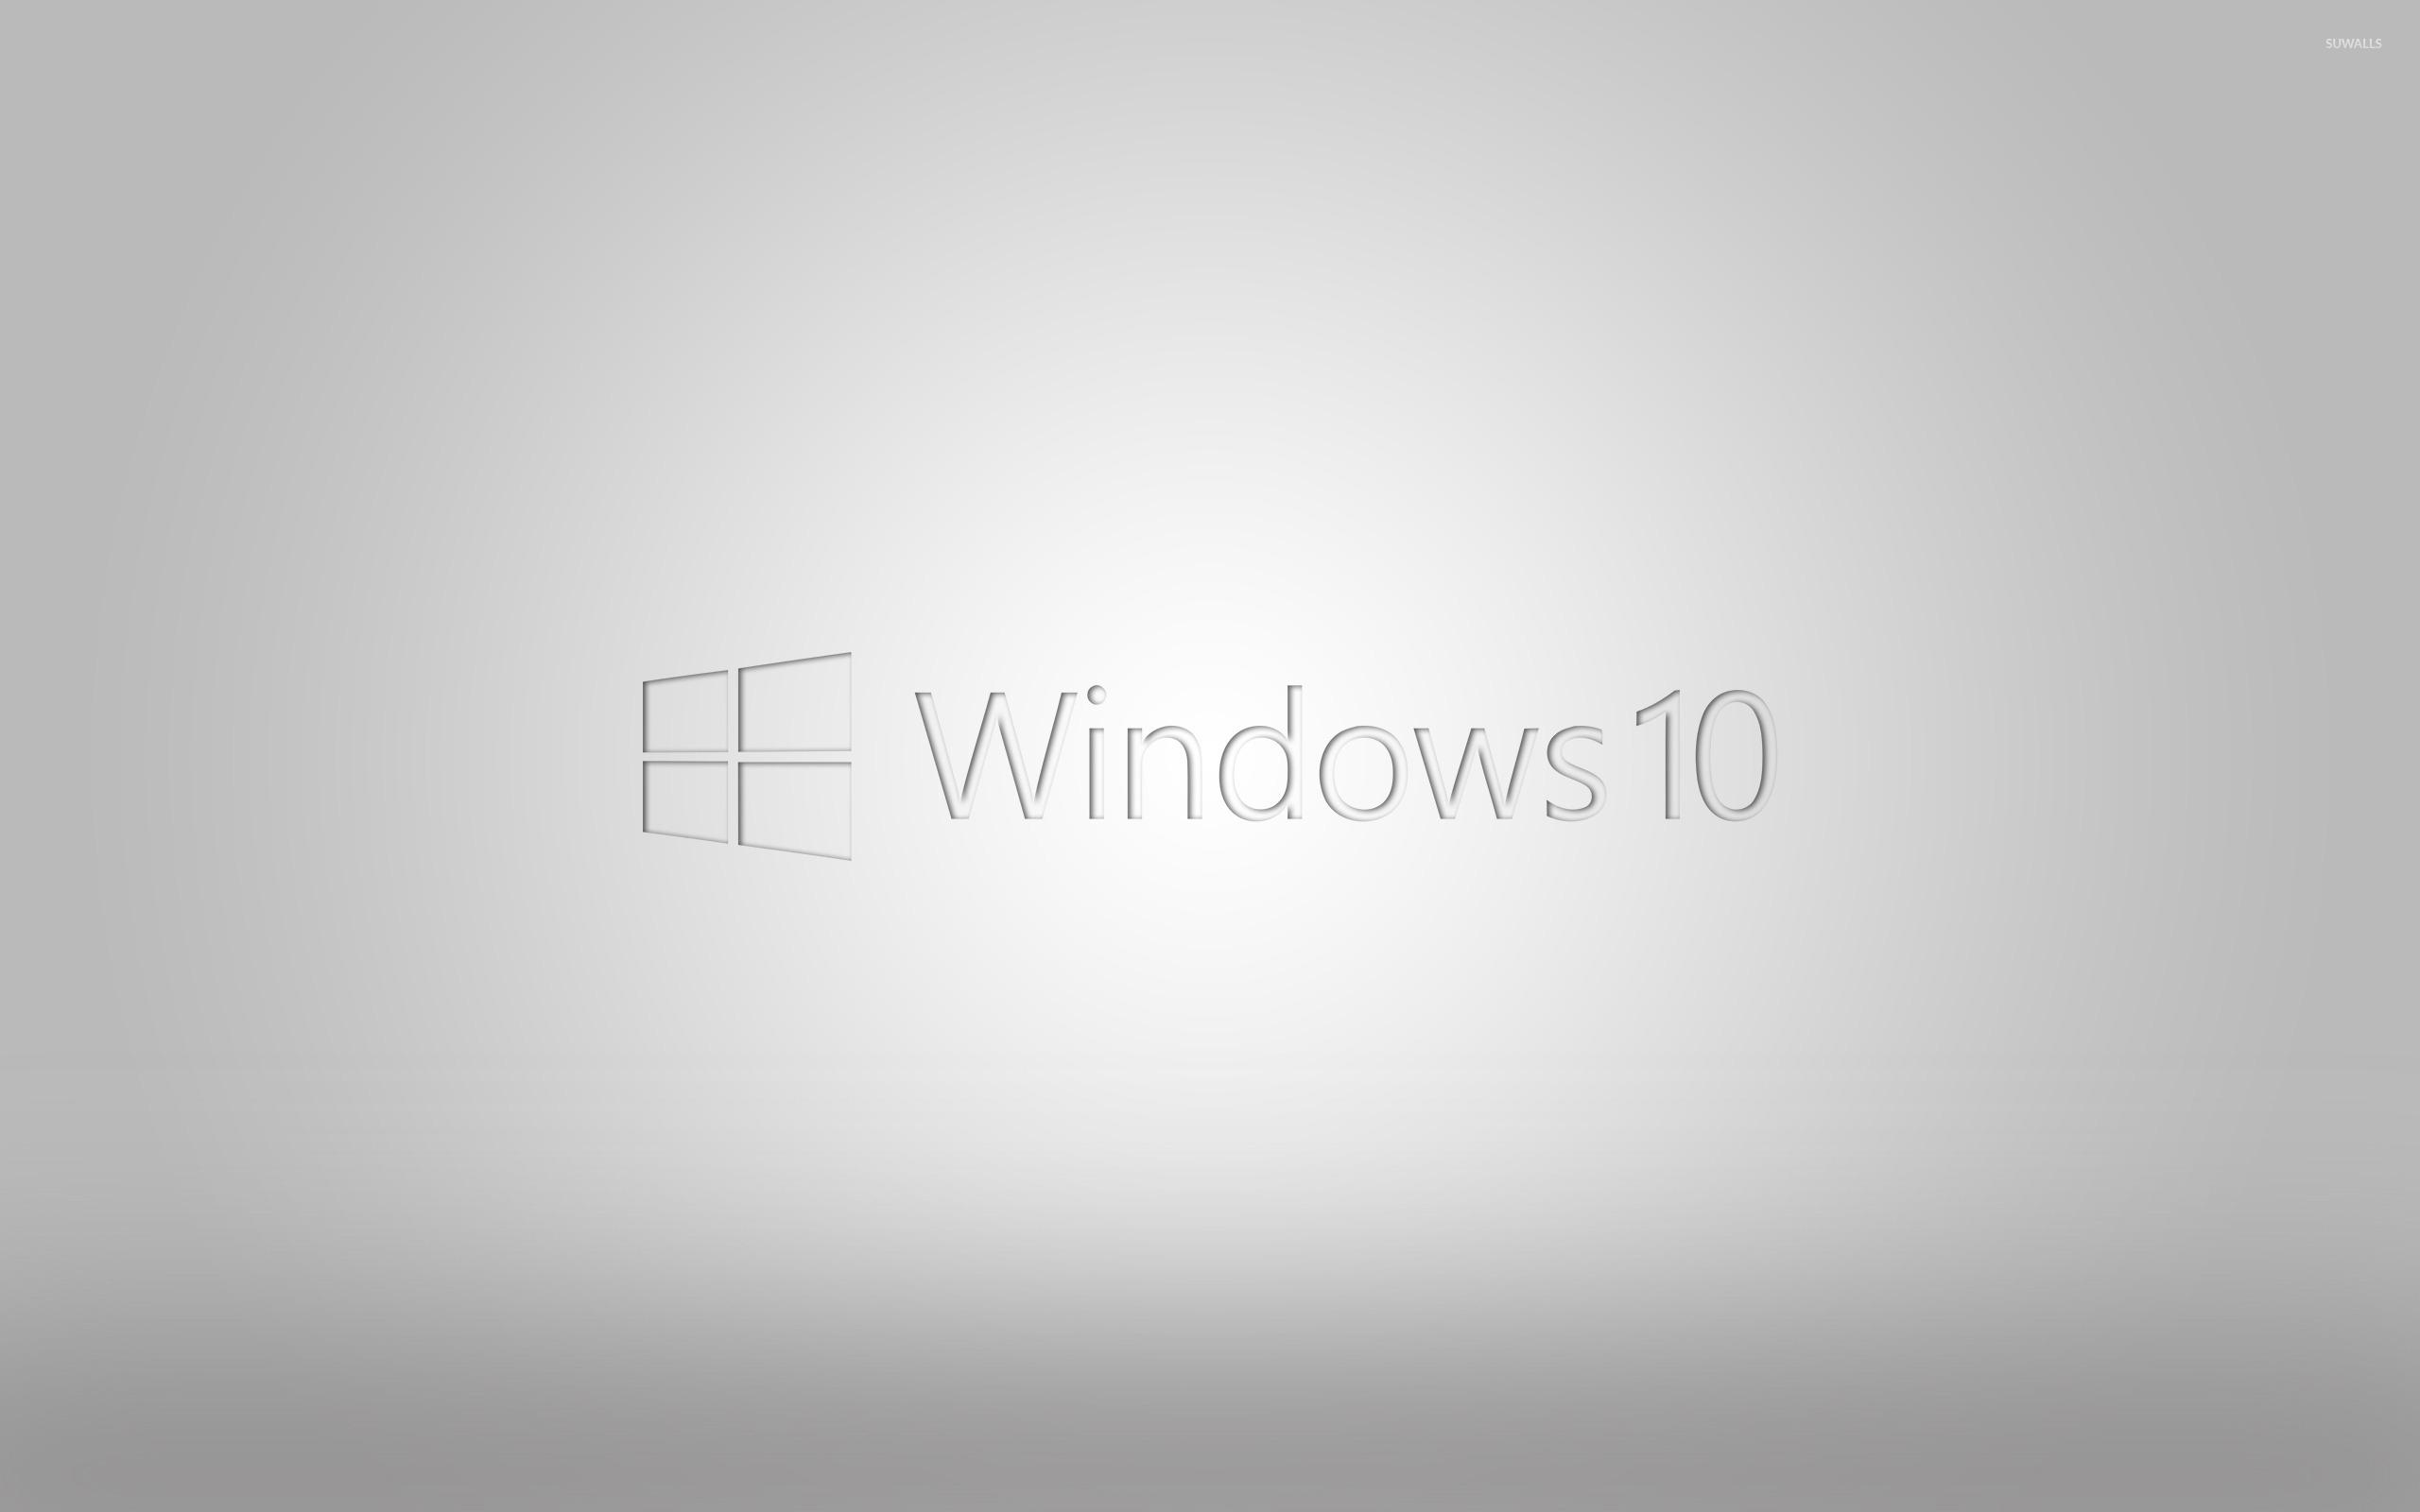 Windows 10 Transparent Logo On Gray Gradient Wallpaper